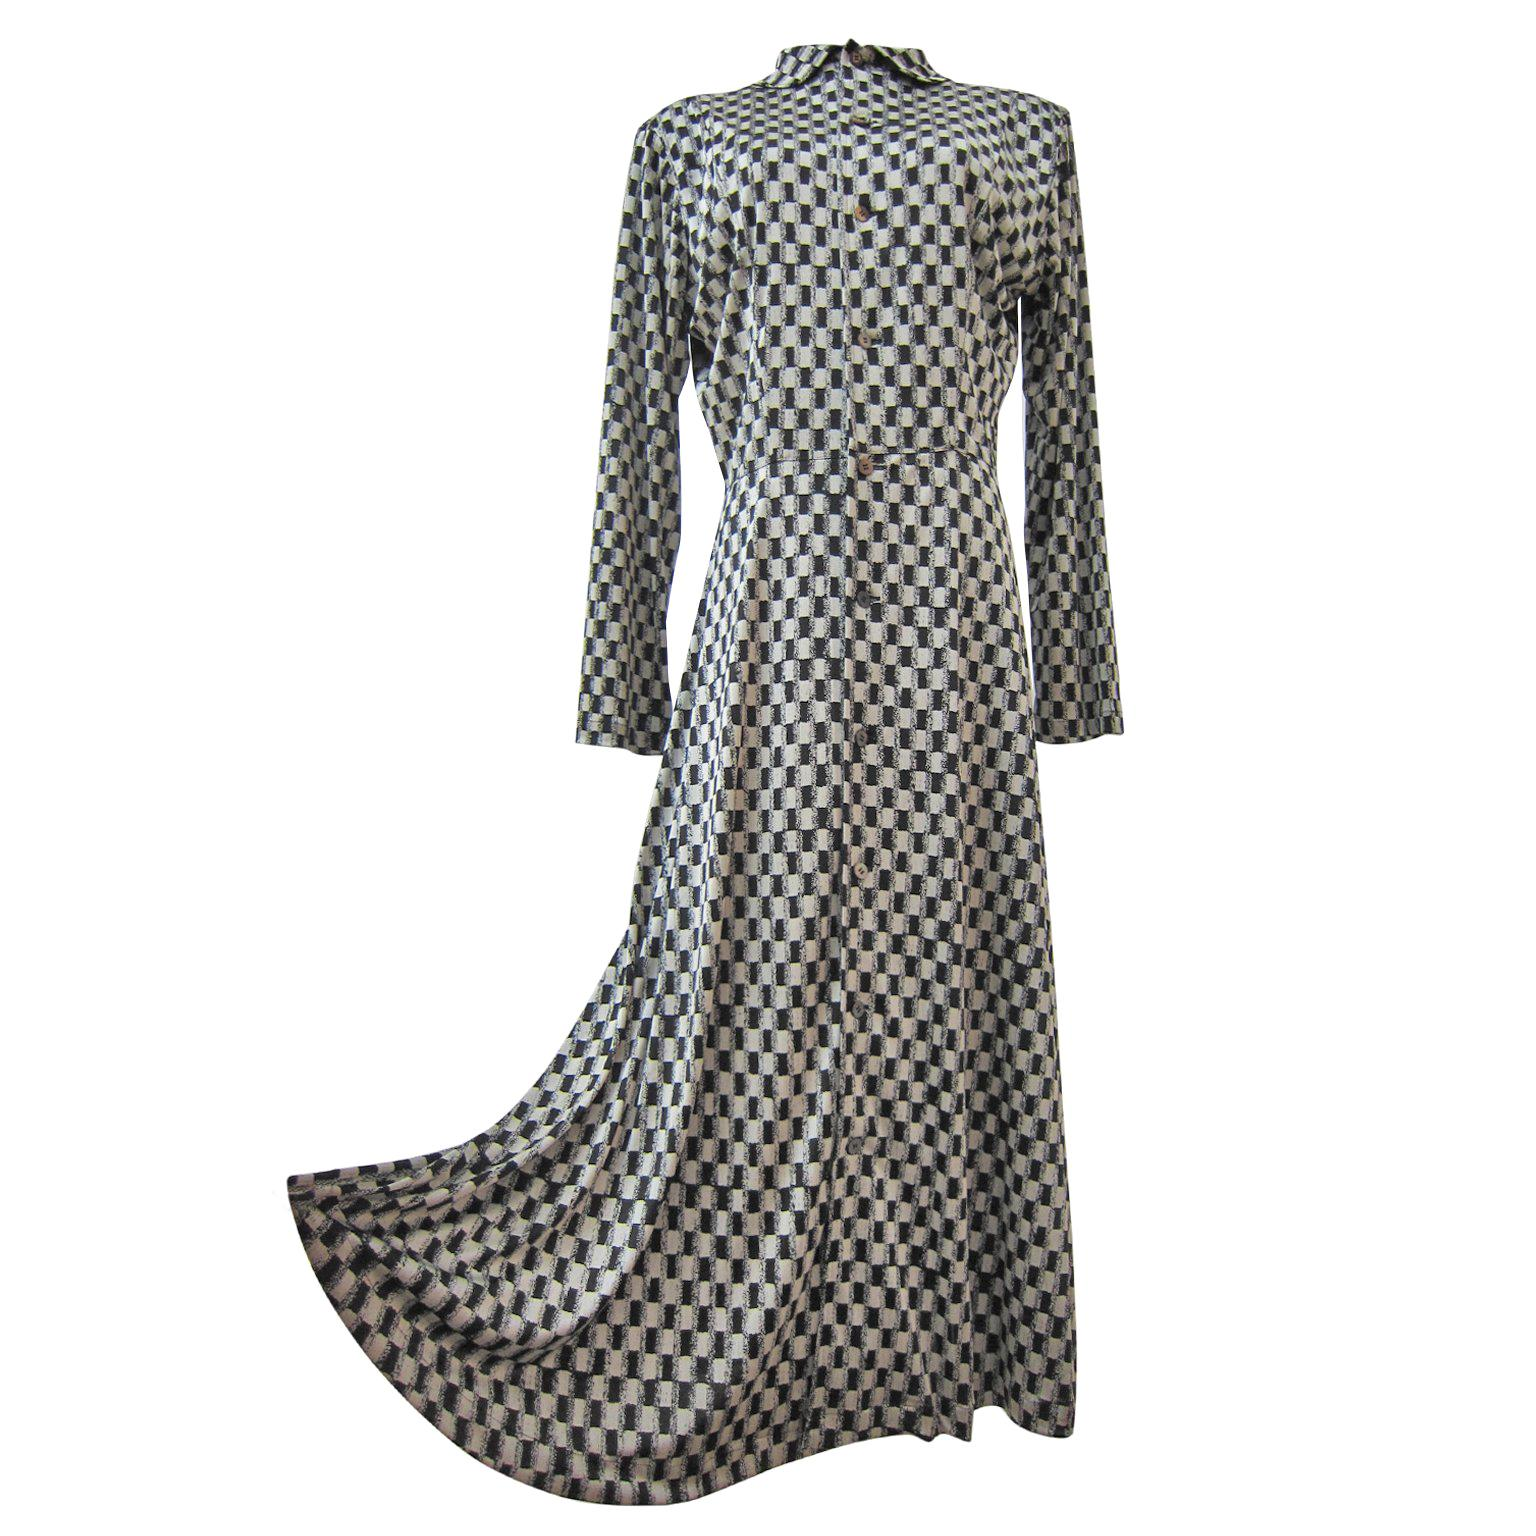 Comme des Garcons Tricot Black White Dress Coat Early 1980s